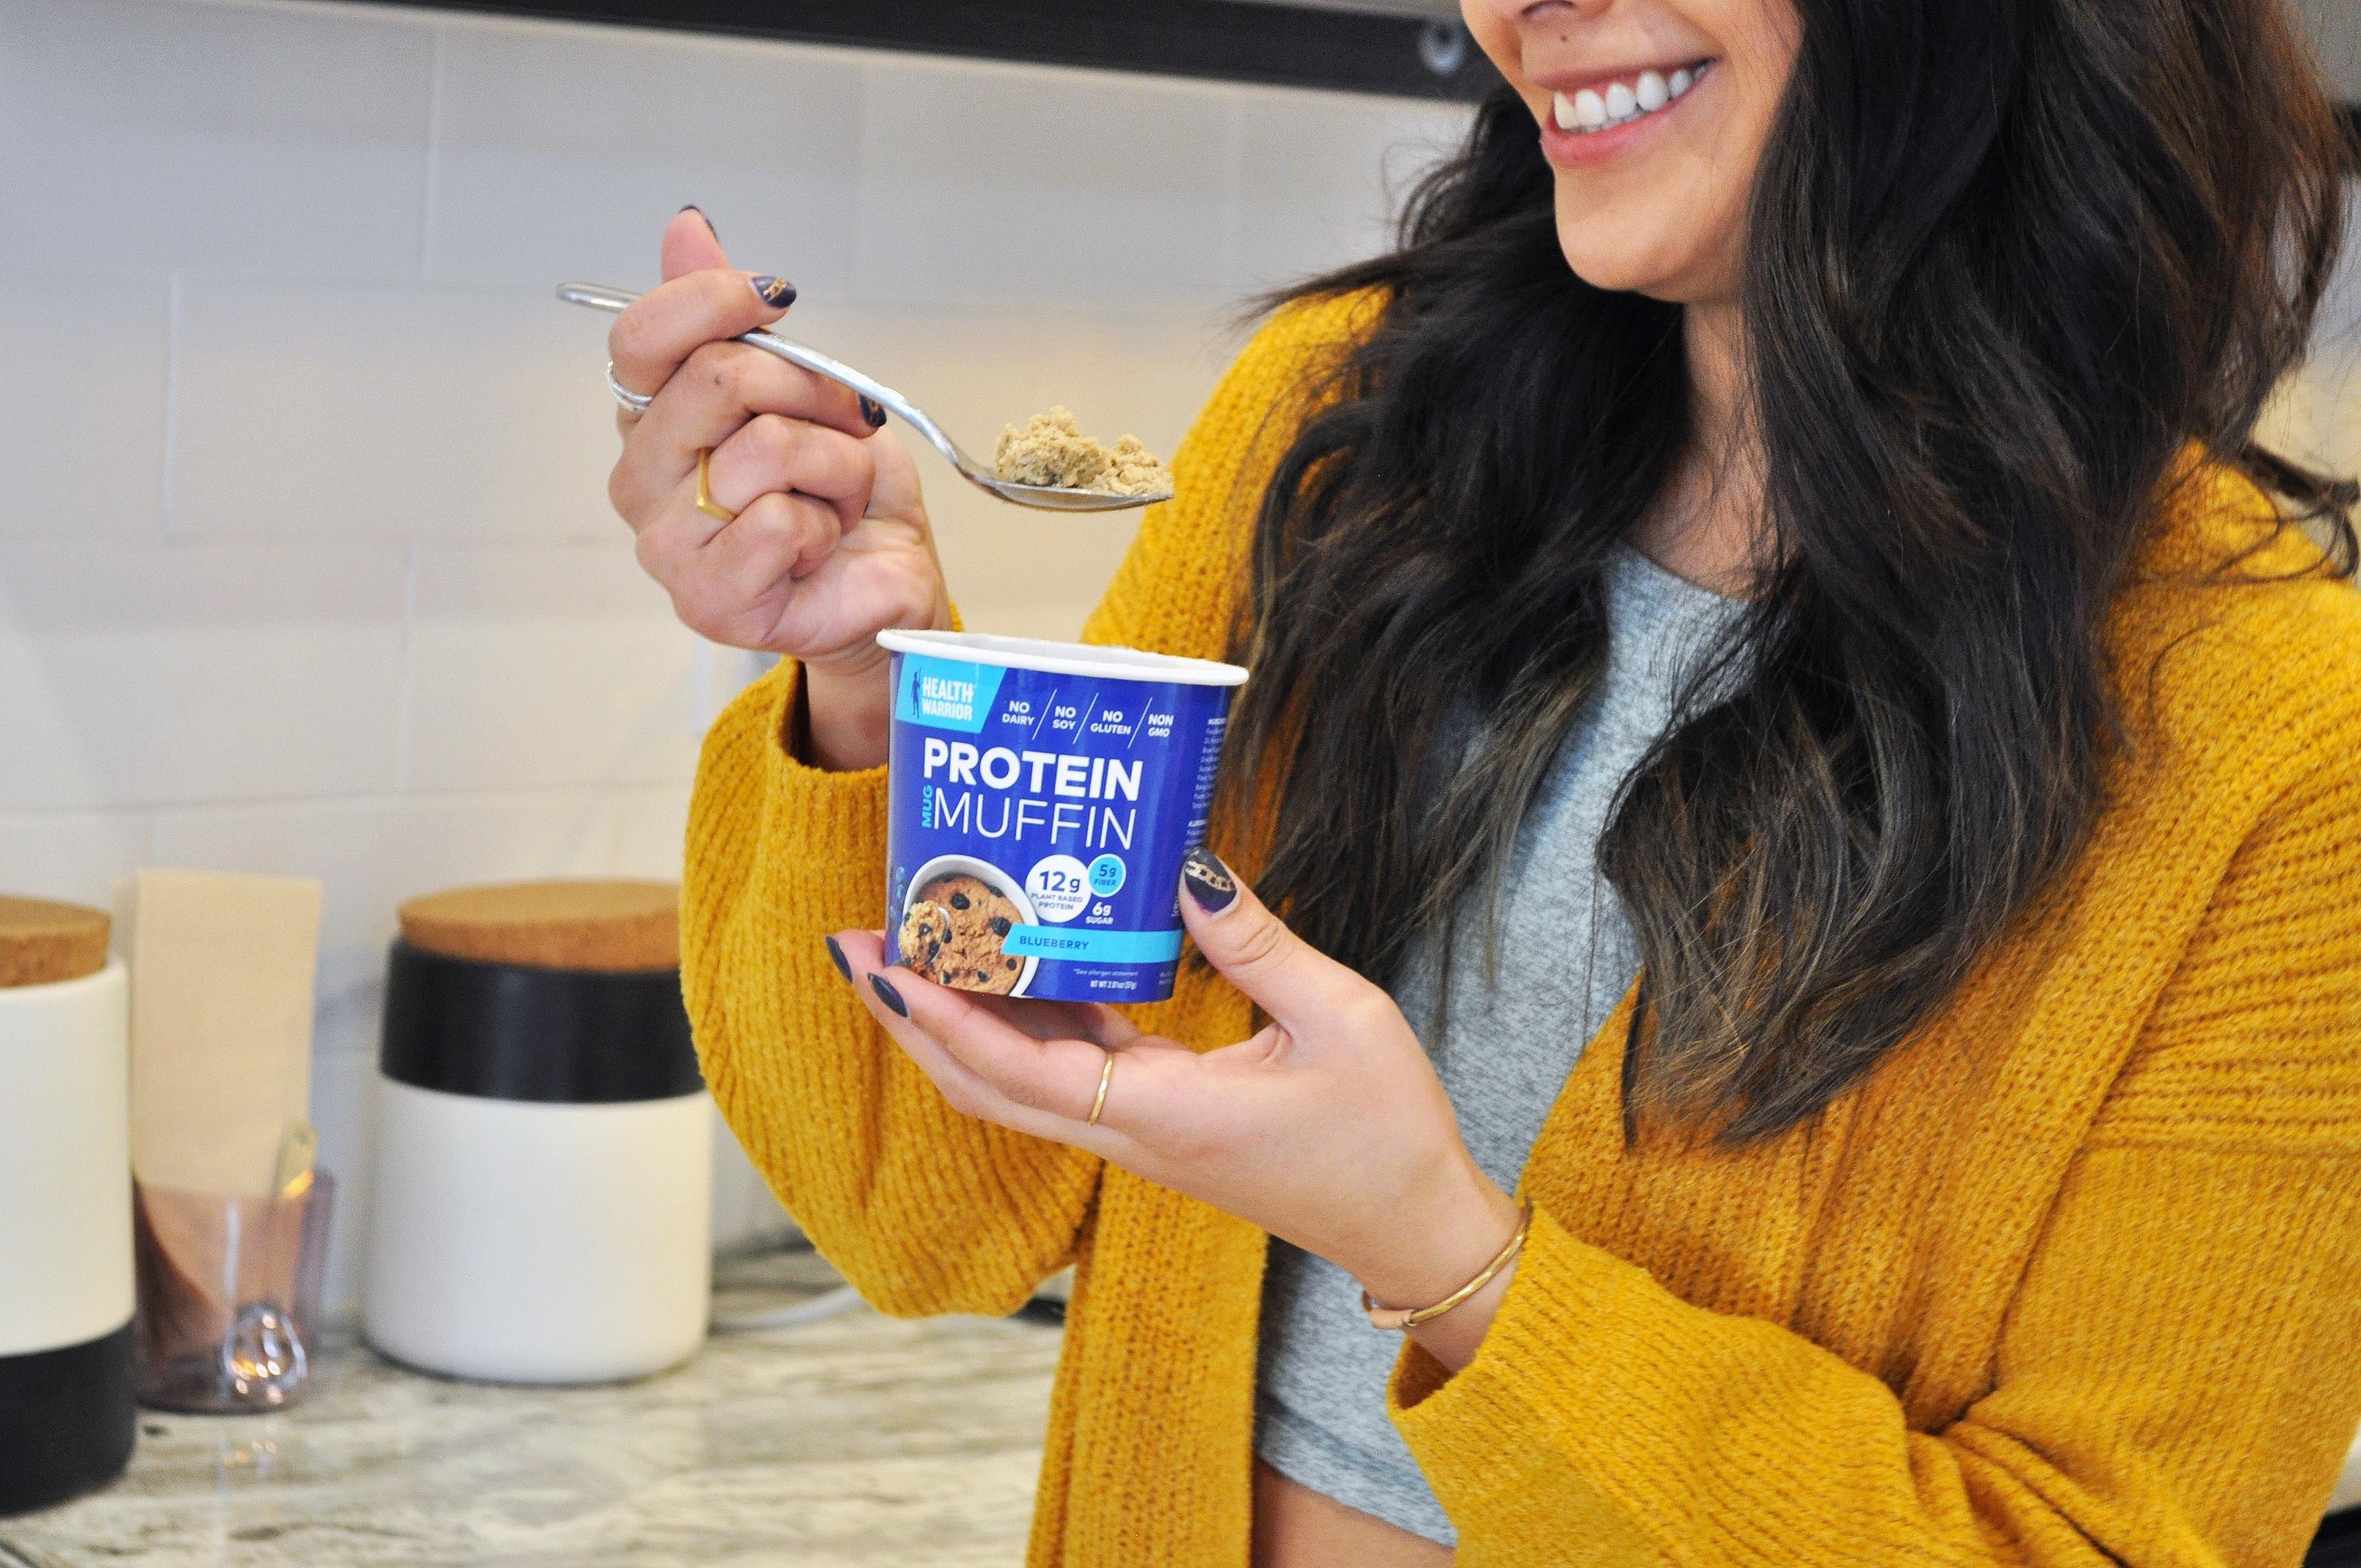 Protein mug breakfast